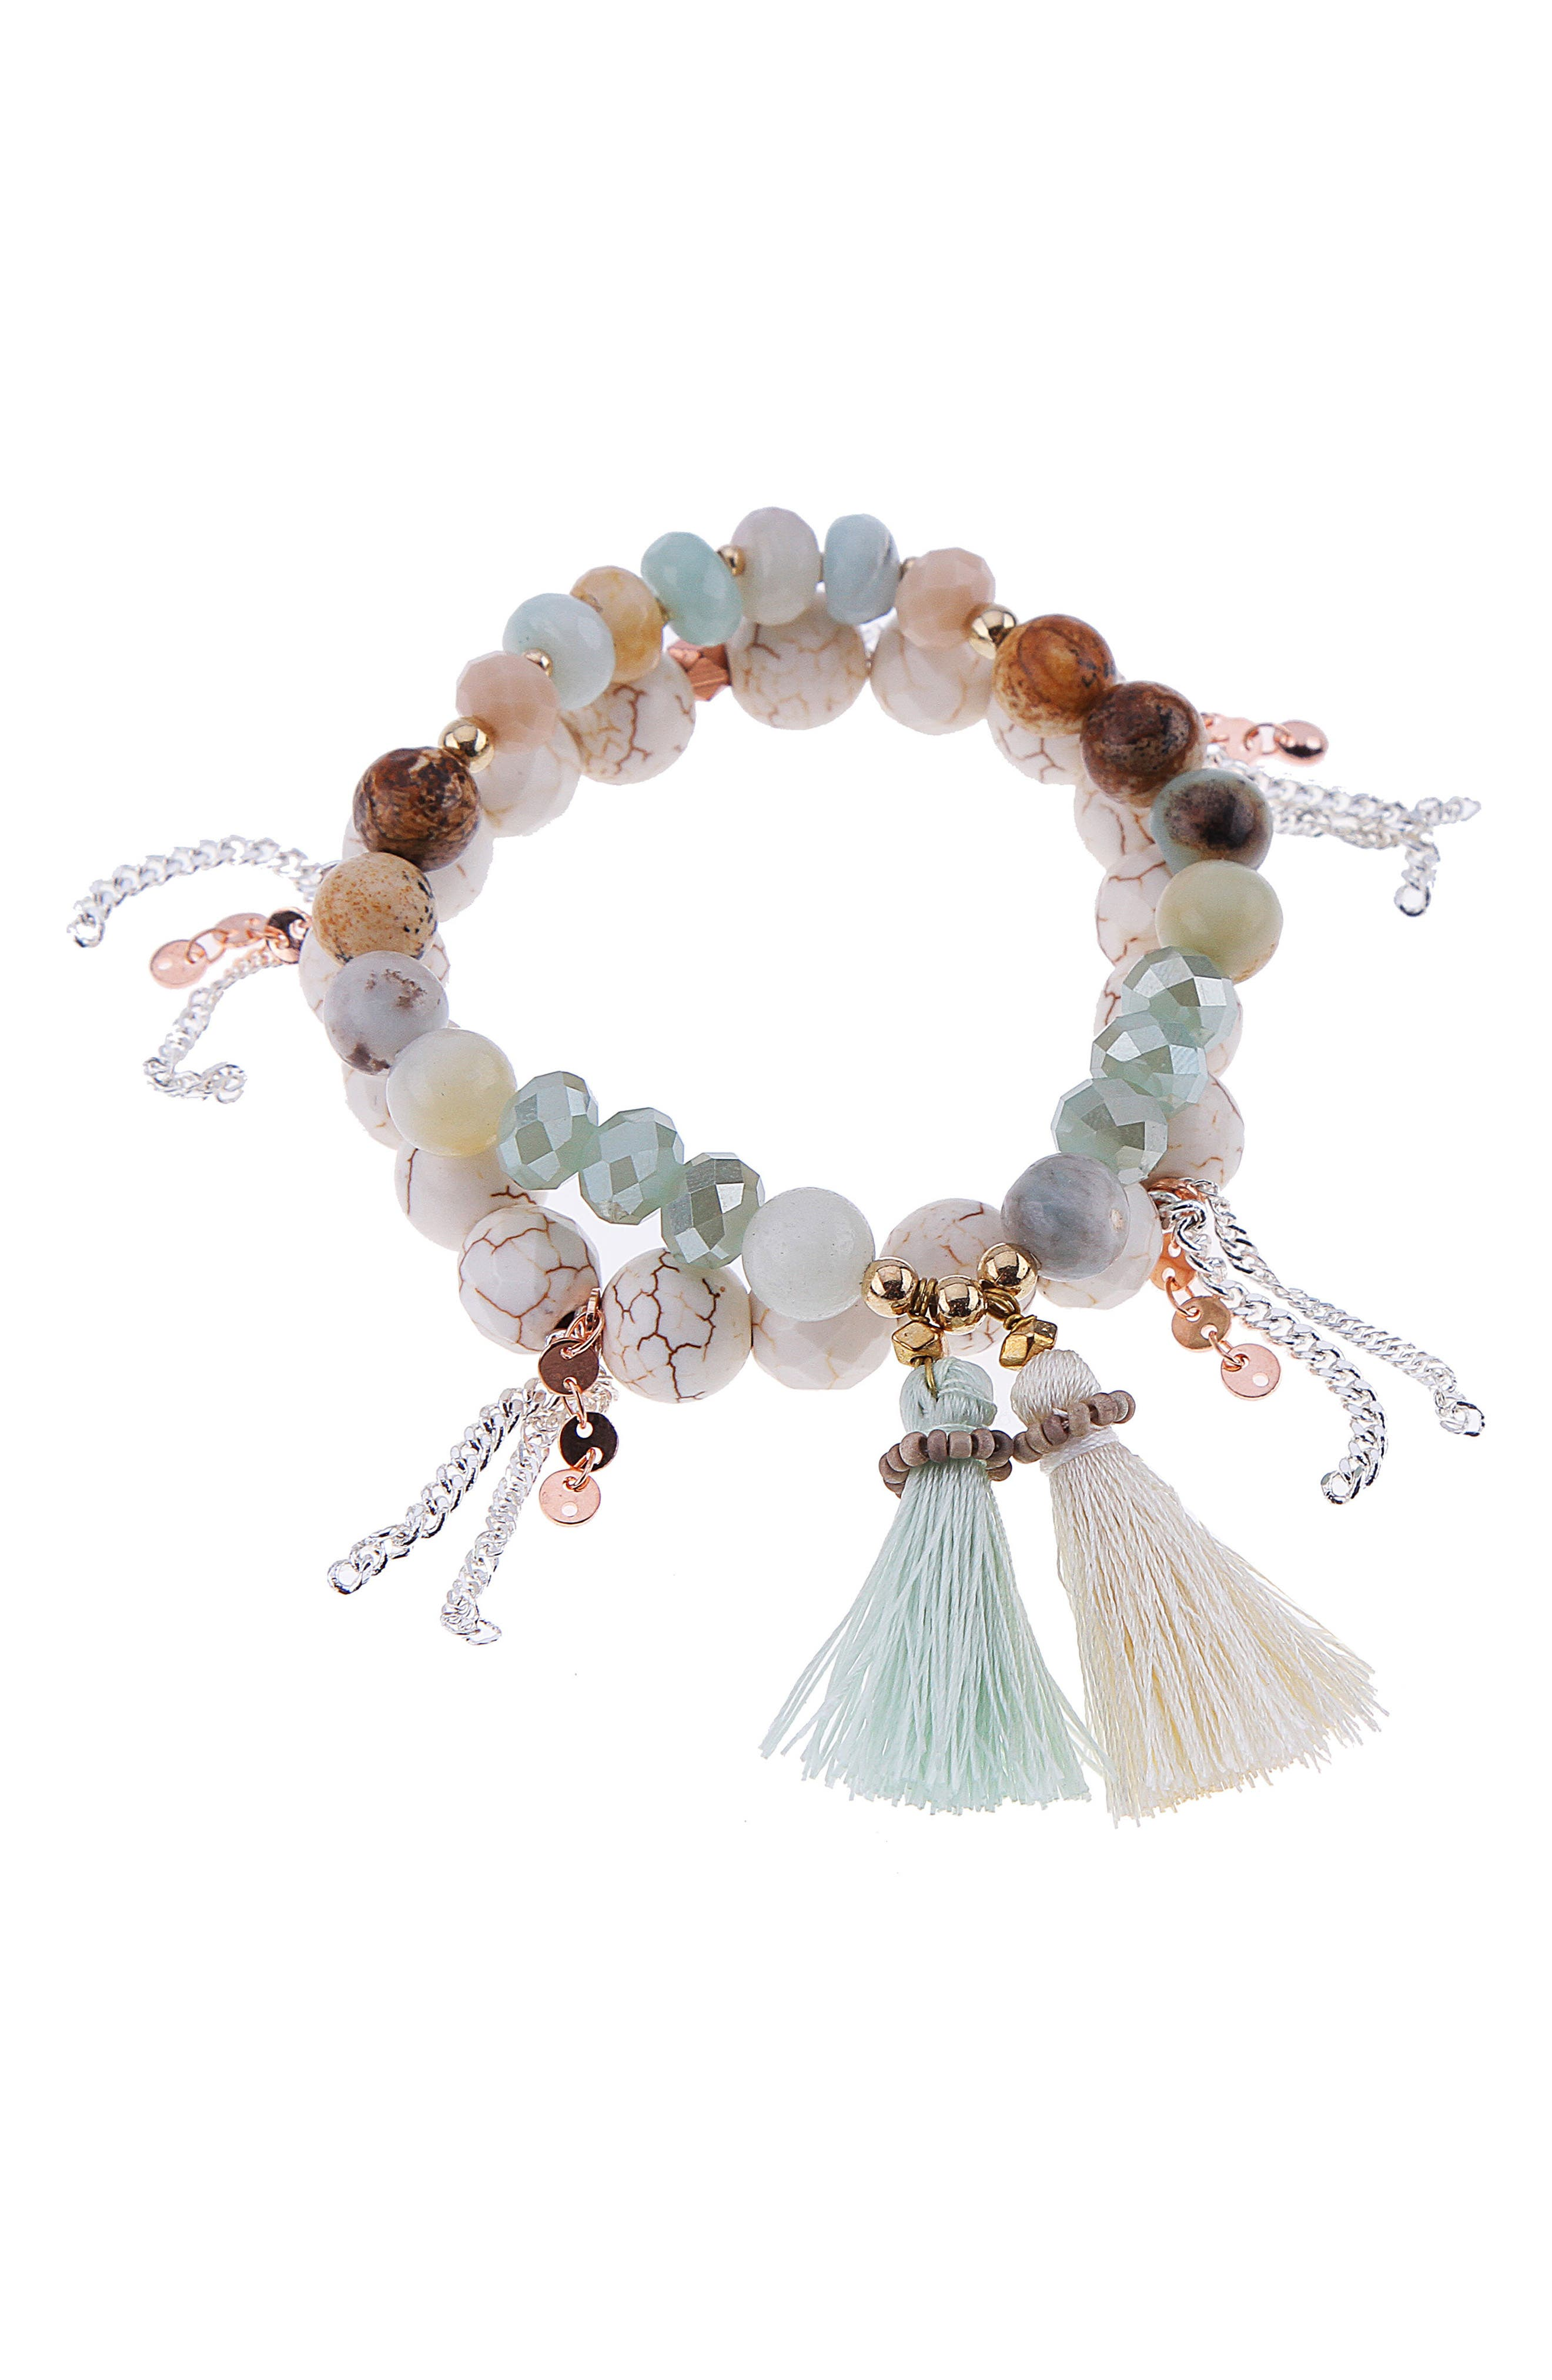 Set of 2 Stone Stretch Bracelets,                             Main thumbnail 1, color,                             AQUA/ WHITE